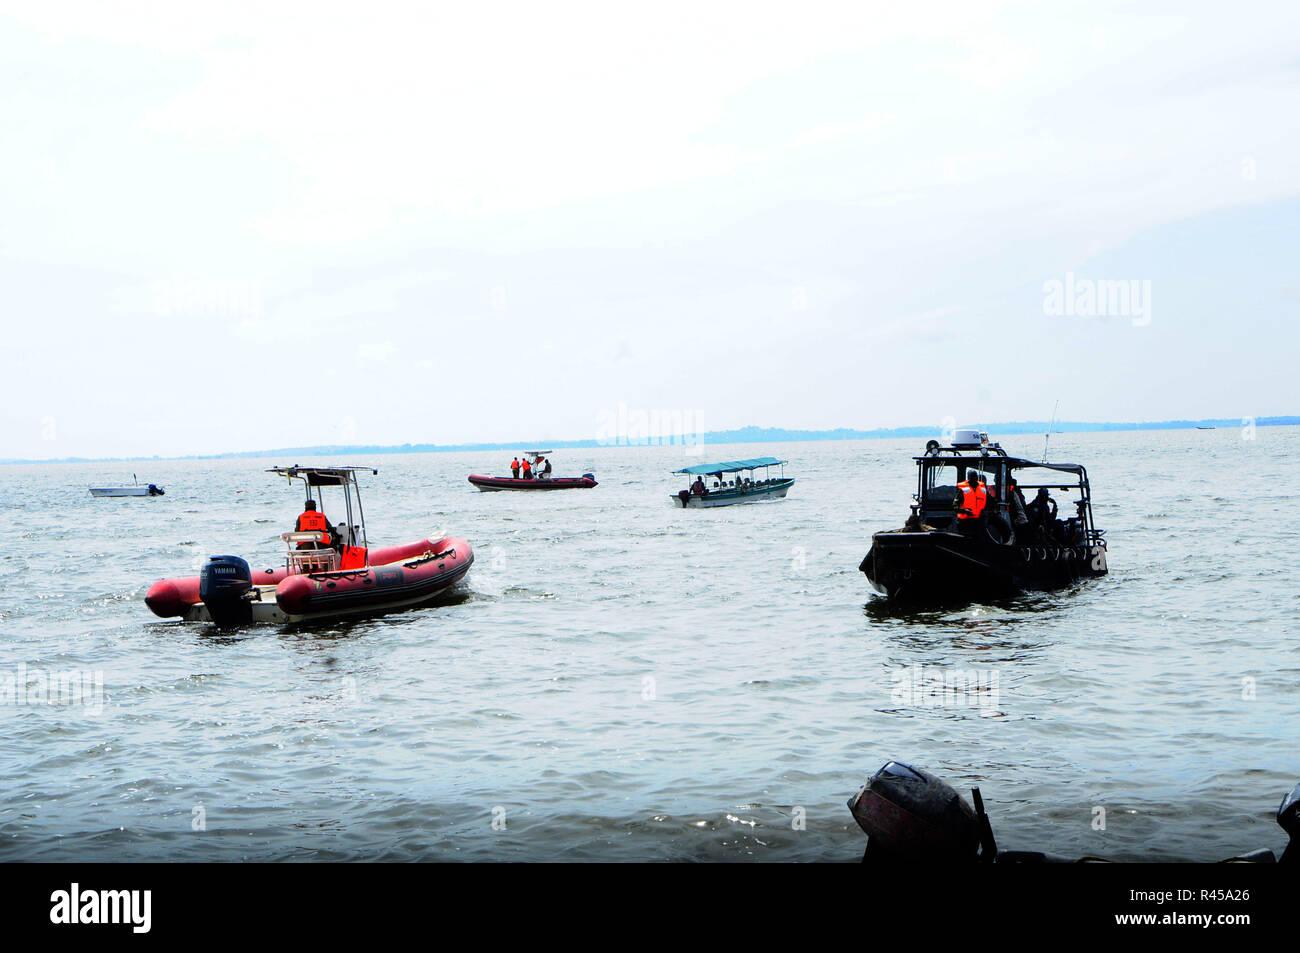 Tragic Fishing Accident In Lake Geneva >> Boat Accident Stock Photos Boat Accident Stock Images Page 3 Alamy